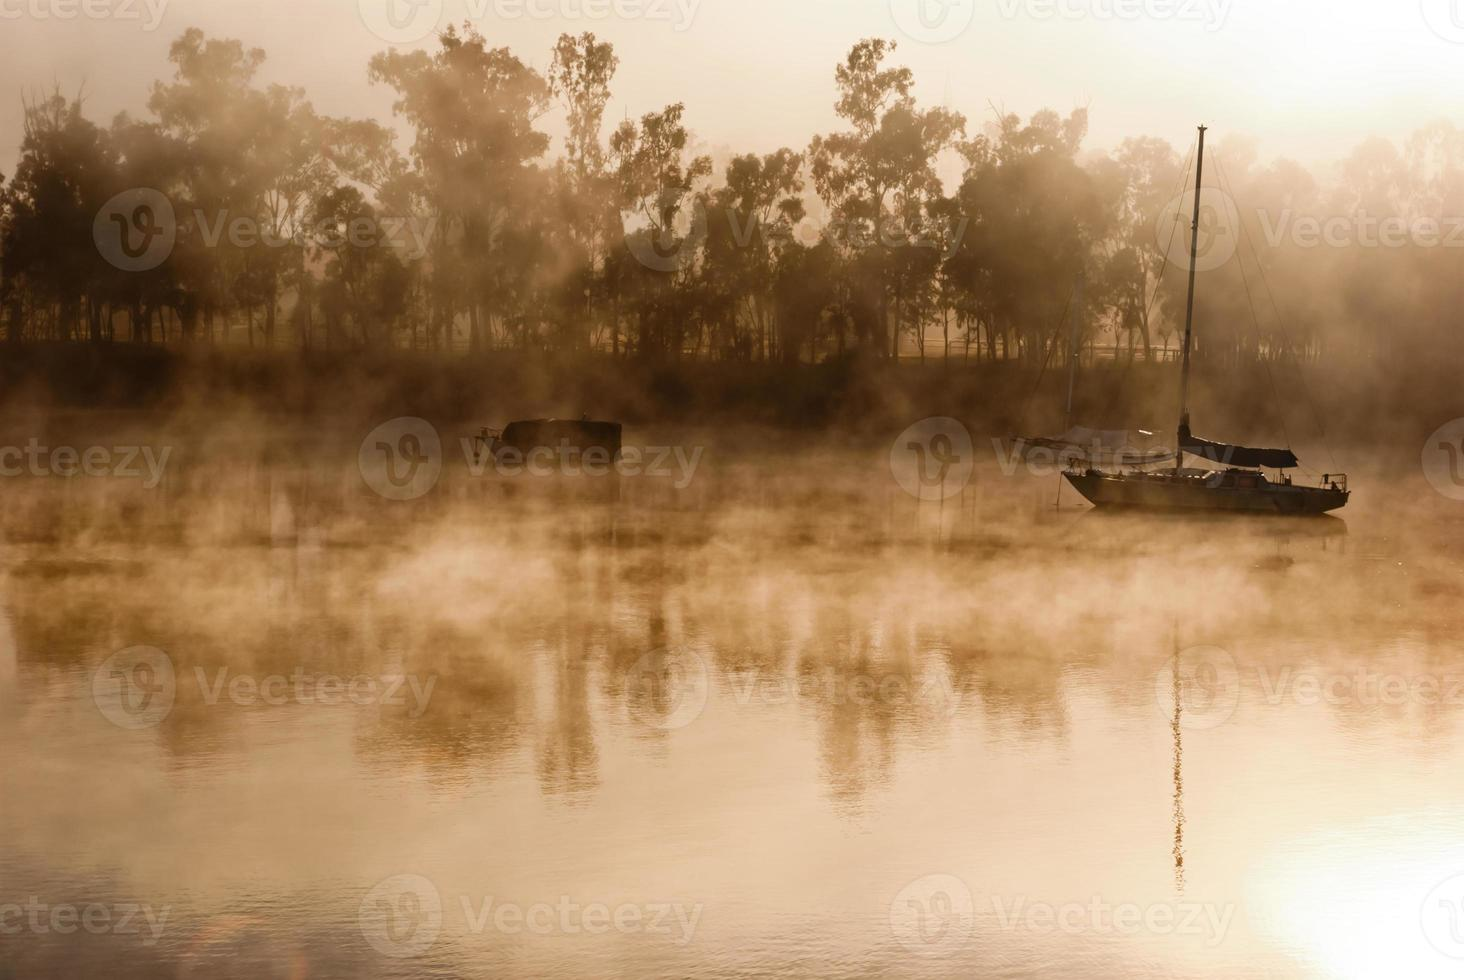 dimmig morgon på en flod med båtar foto